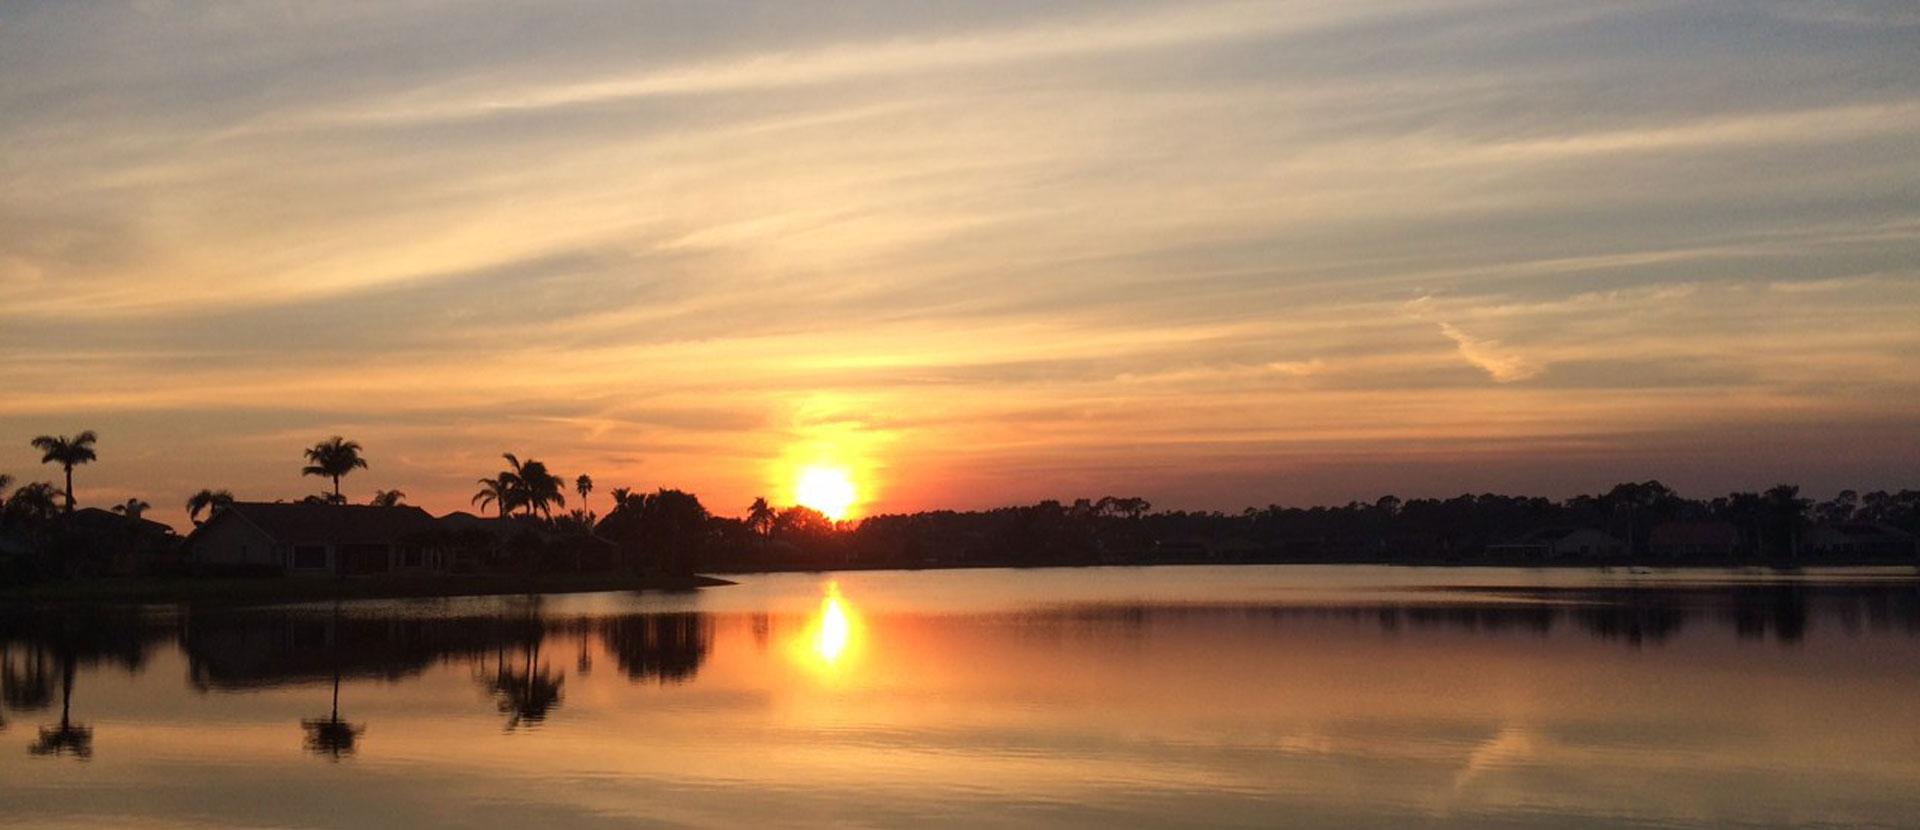 Naples, Florida sunset at New Waterford at Berkshire Lakes Condominium Association